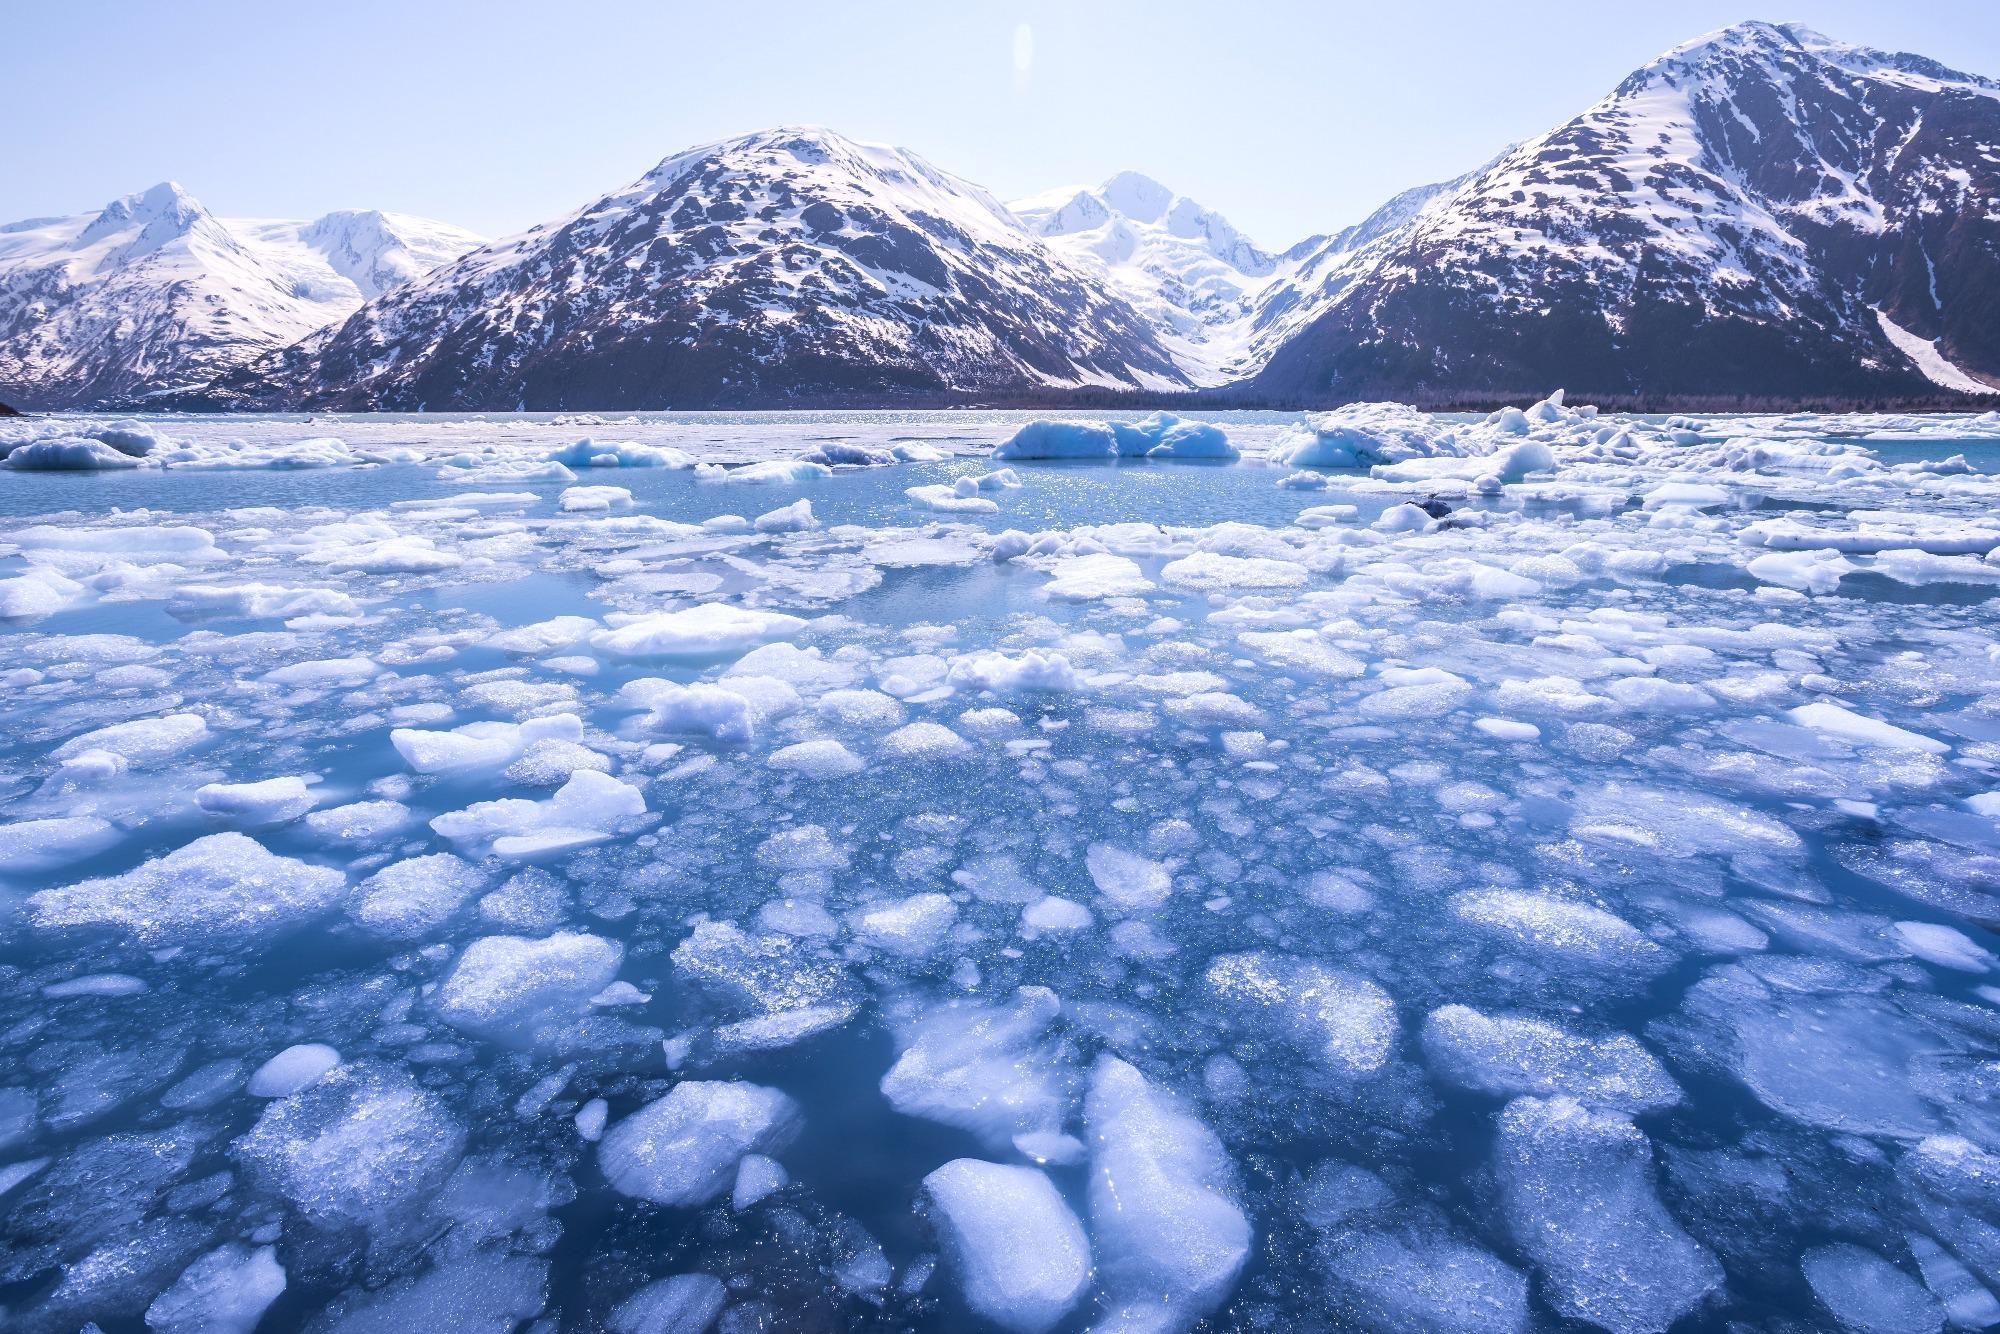 Sulfur Intervention Induced Solar Geoengineering to Reduce Greenland Icecap Melting